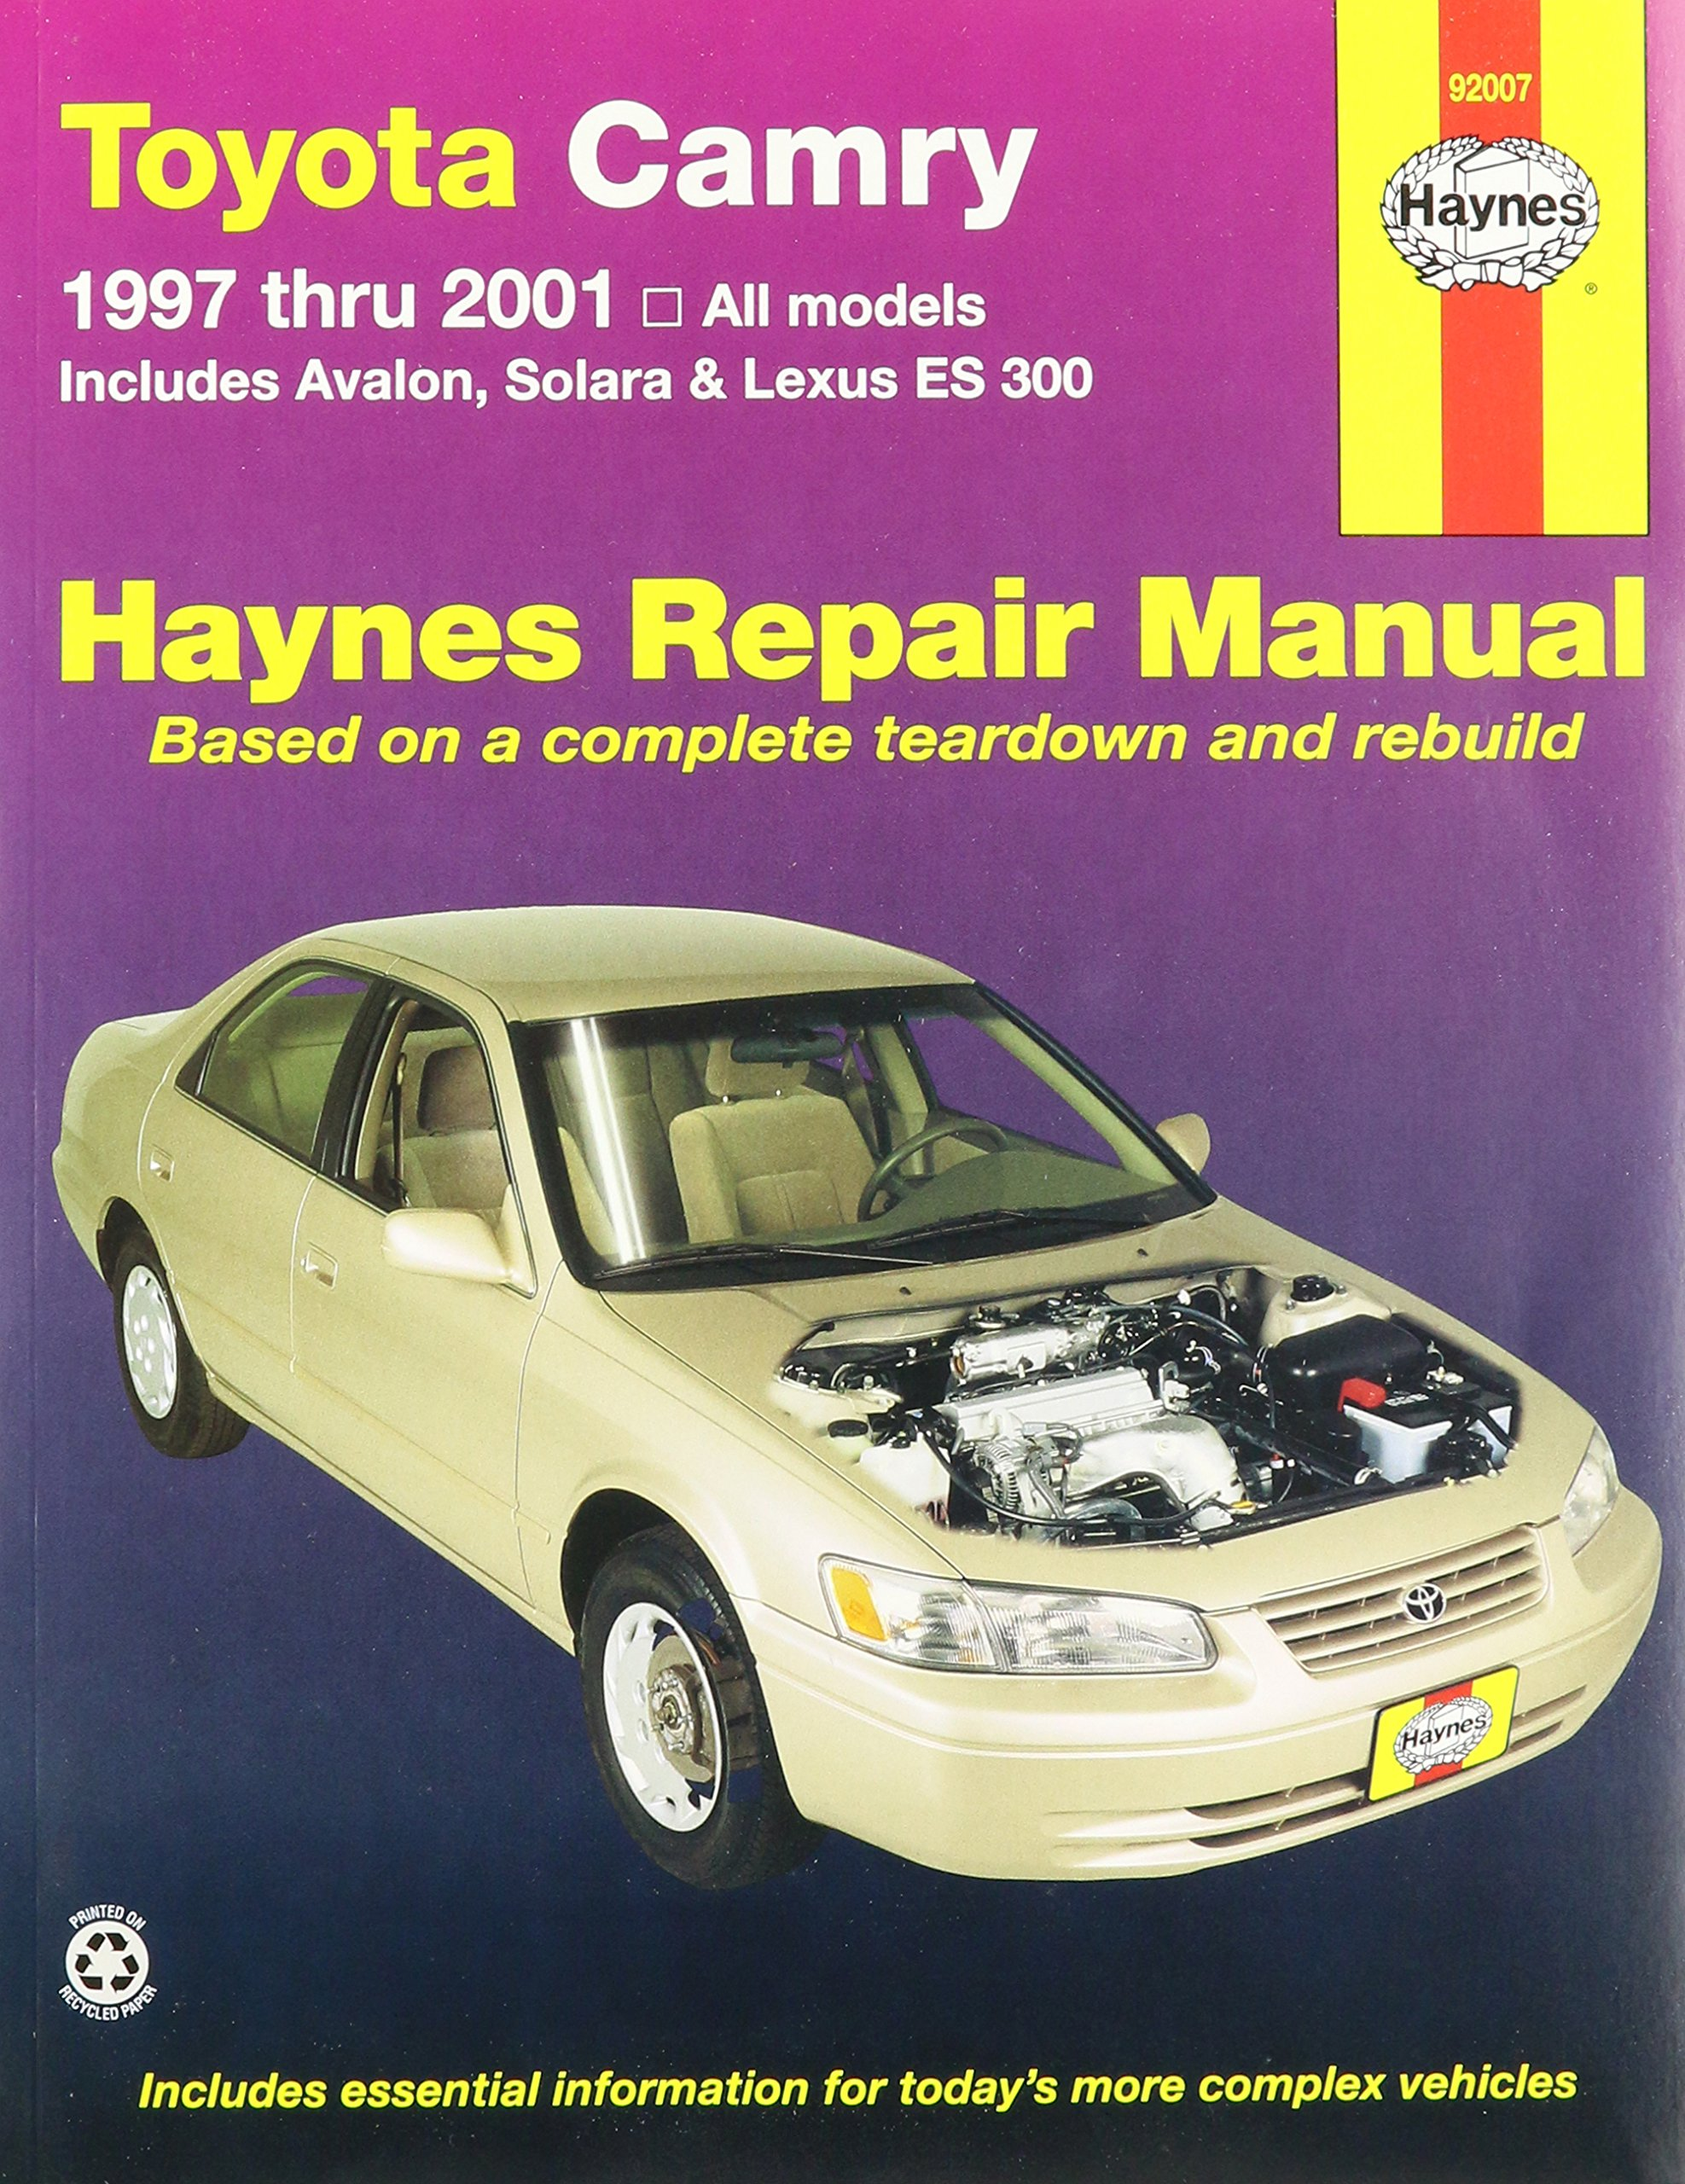 haynes toyota camry 97 01 manual 5055415932311 amazon com books rh amazon com 99 camry repair manual 1999 toyota camry repair manual free